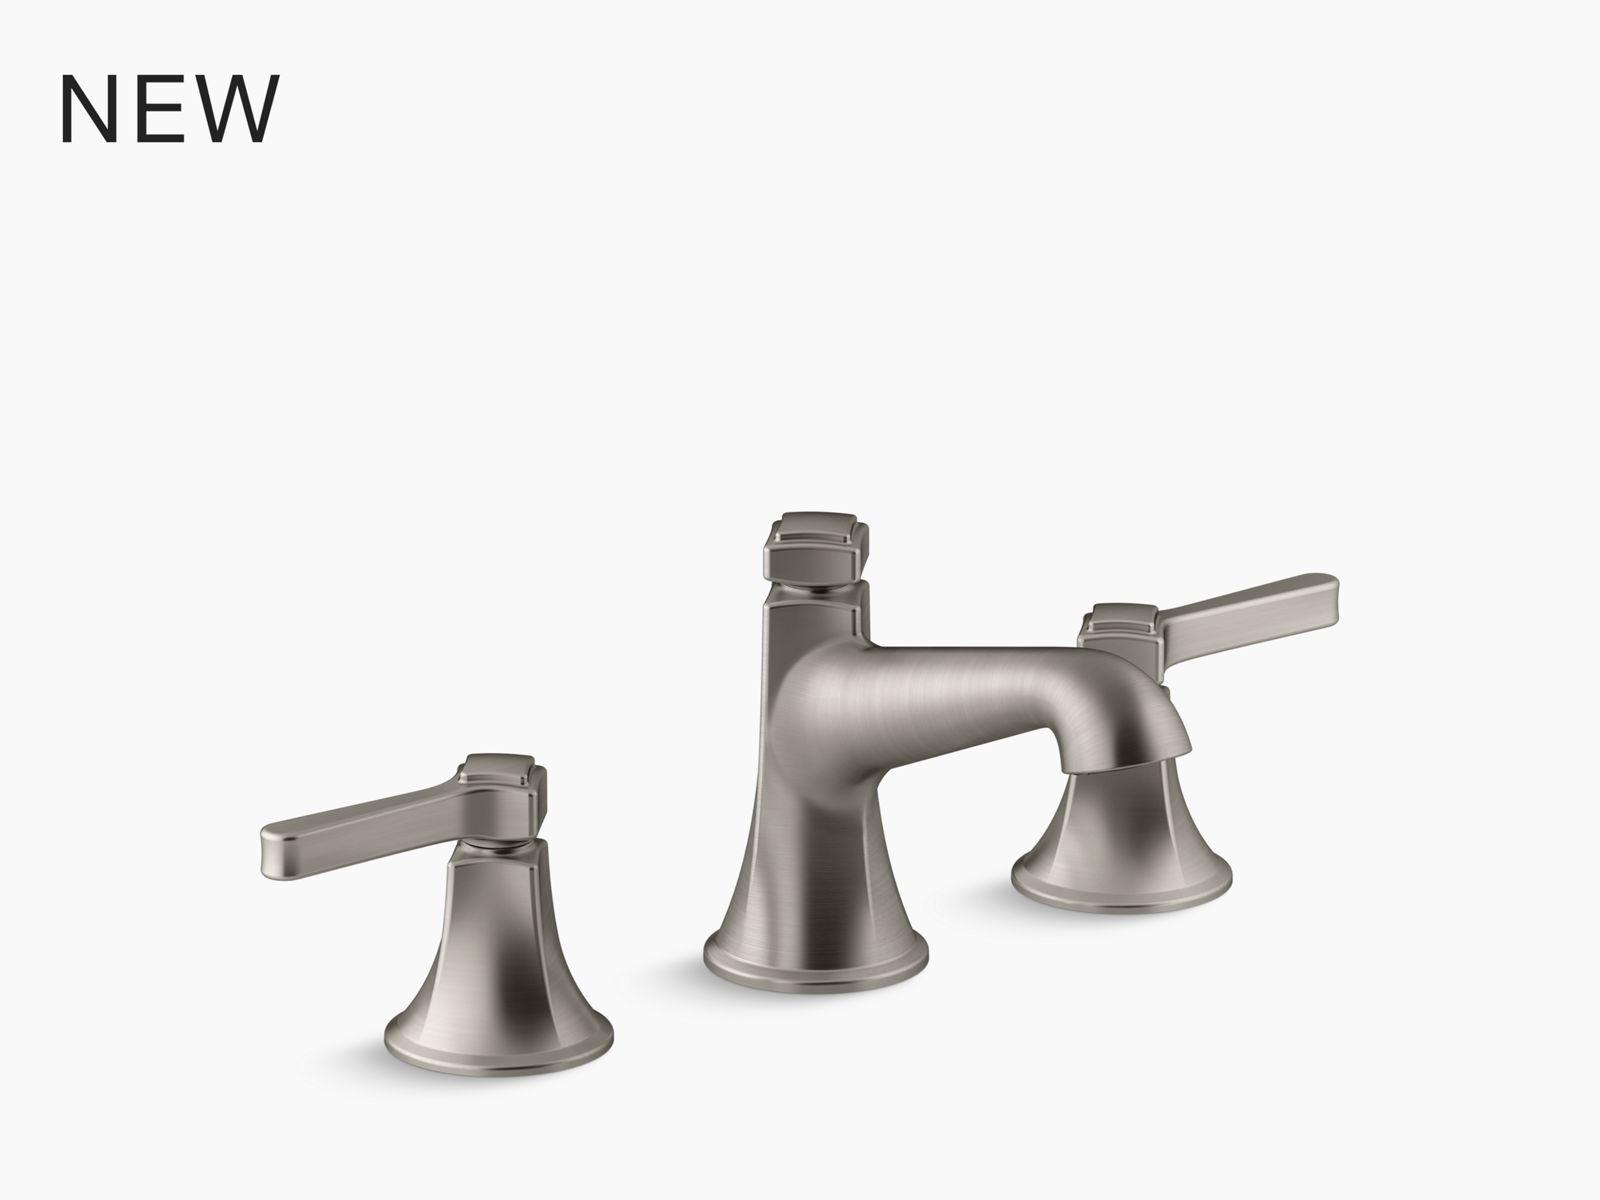 rubicon two handle 4 centerset bathroom faucet